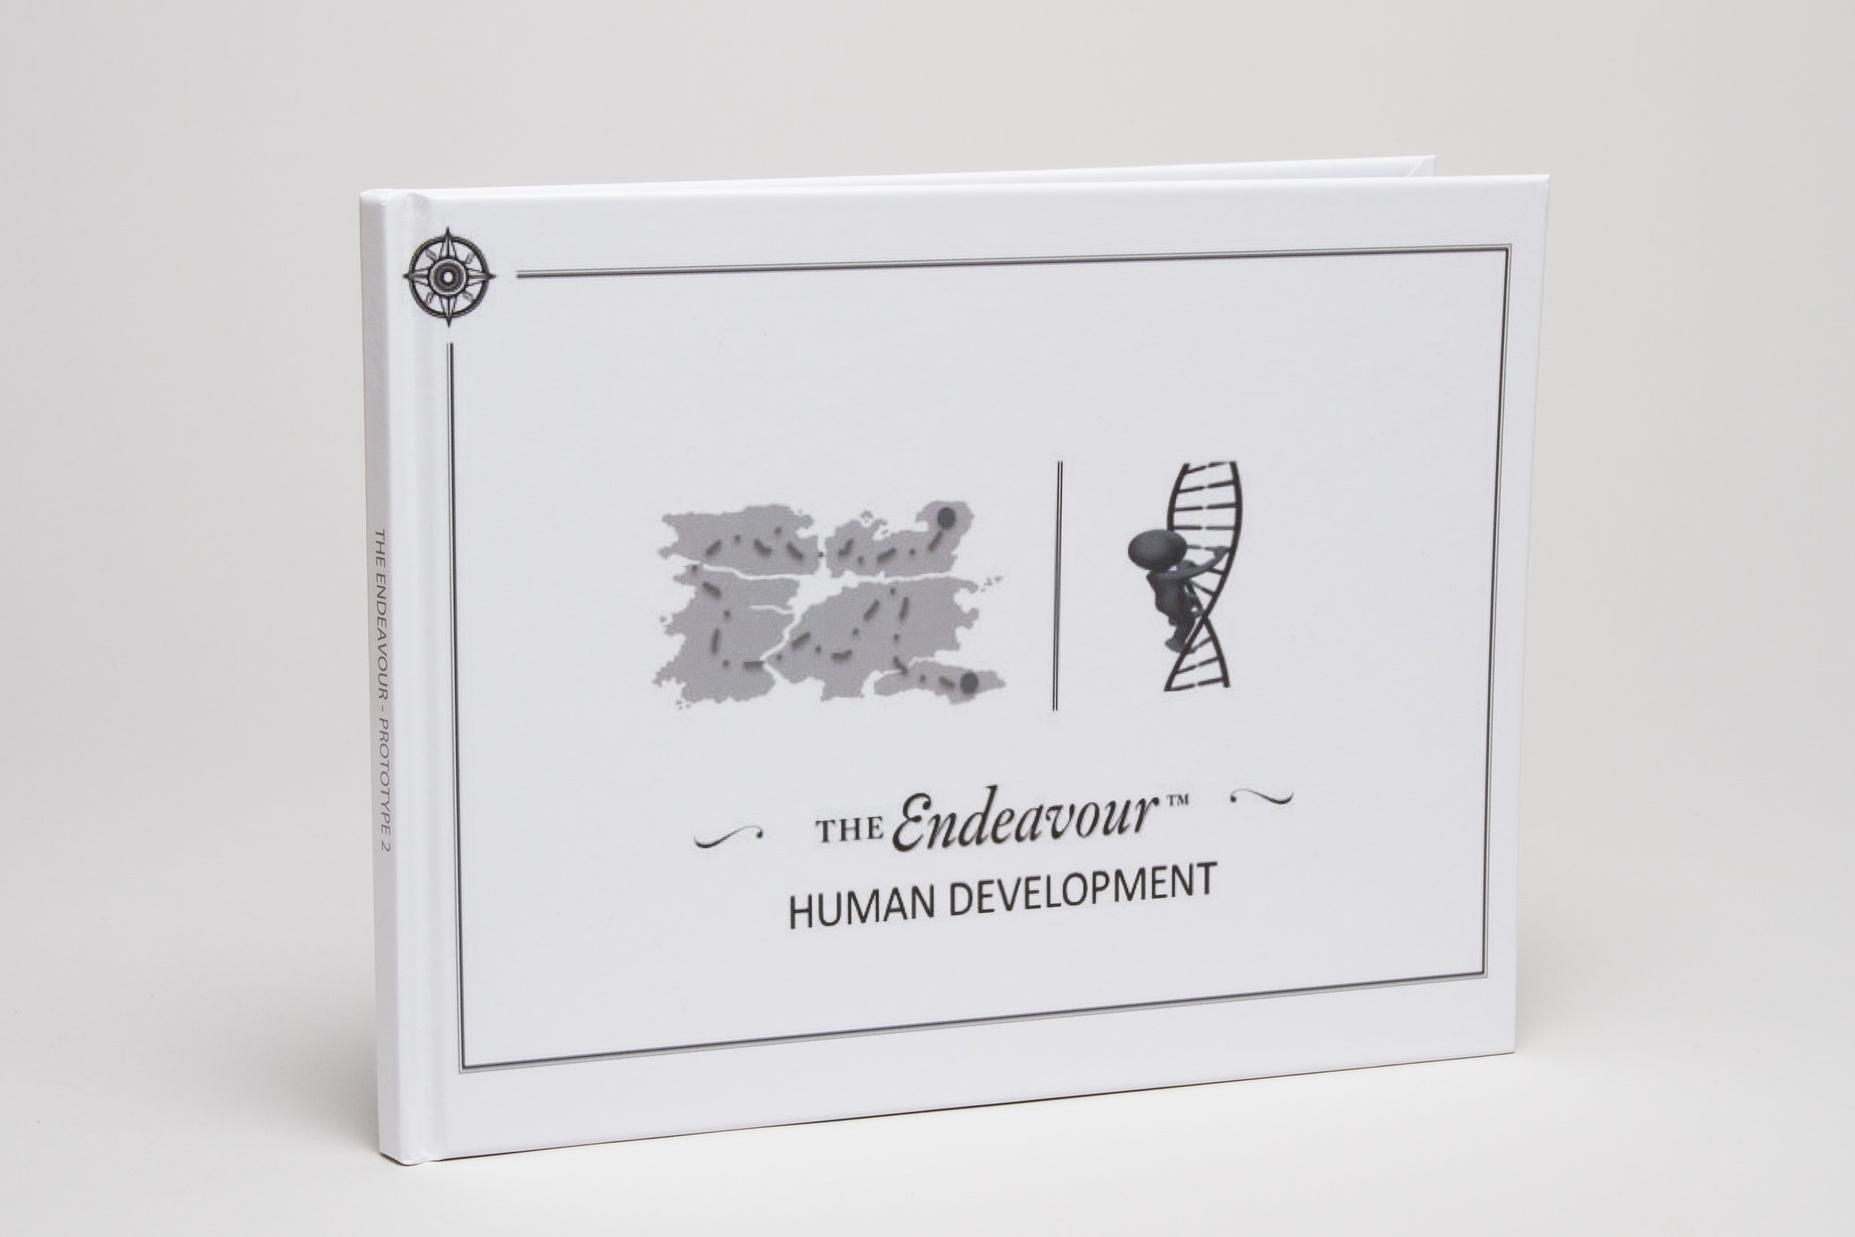 The Endeavour - Human Development